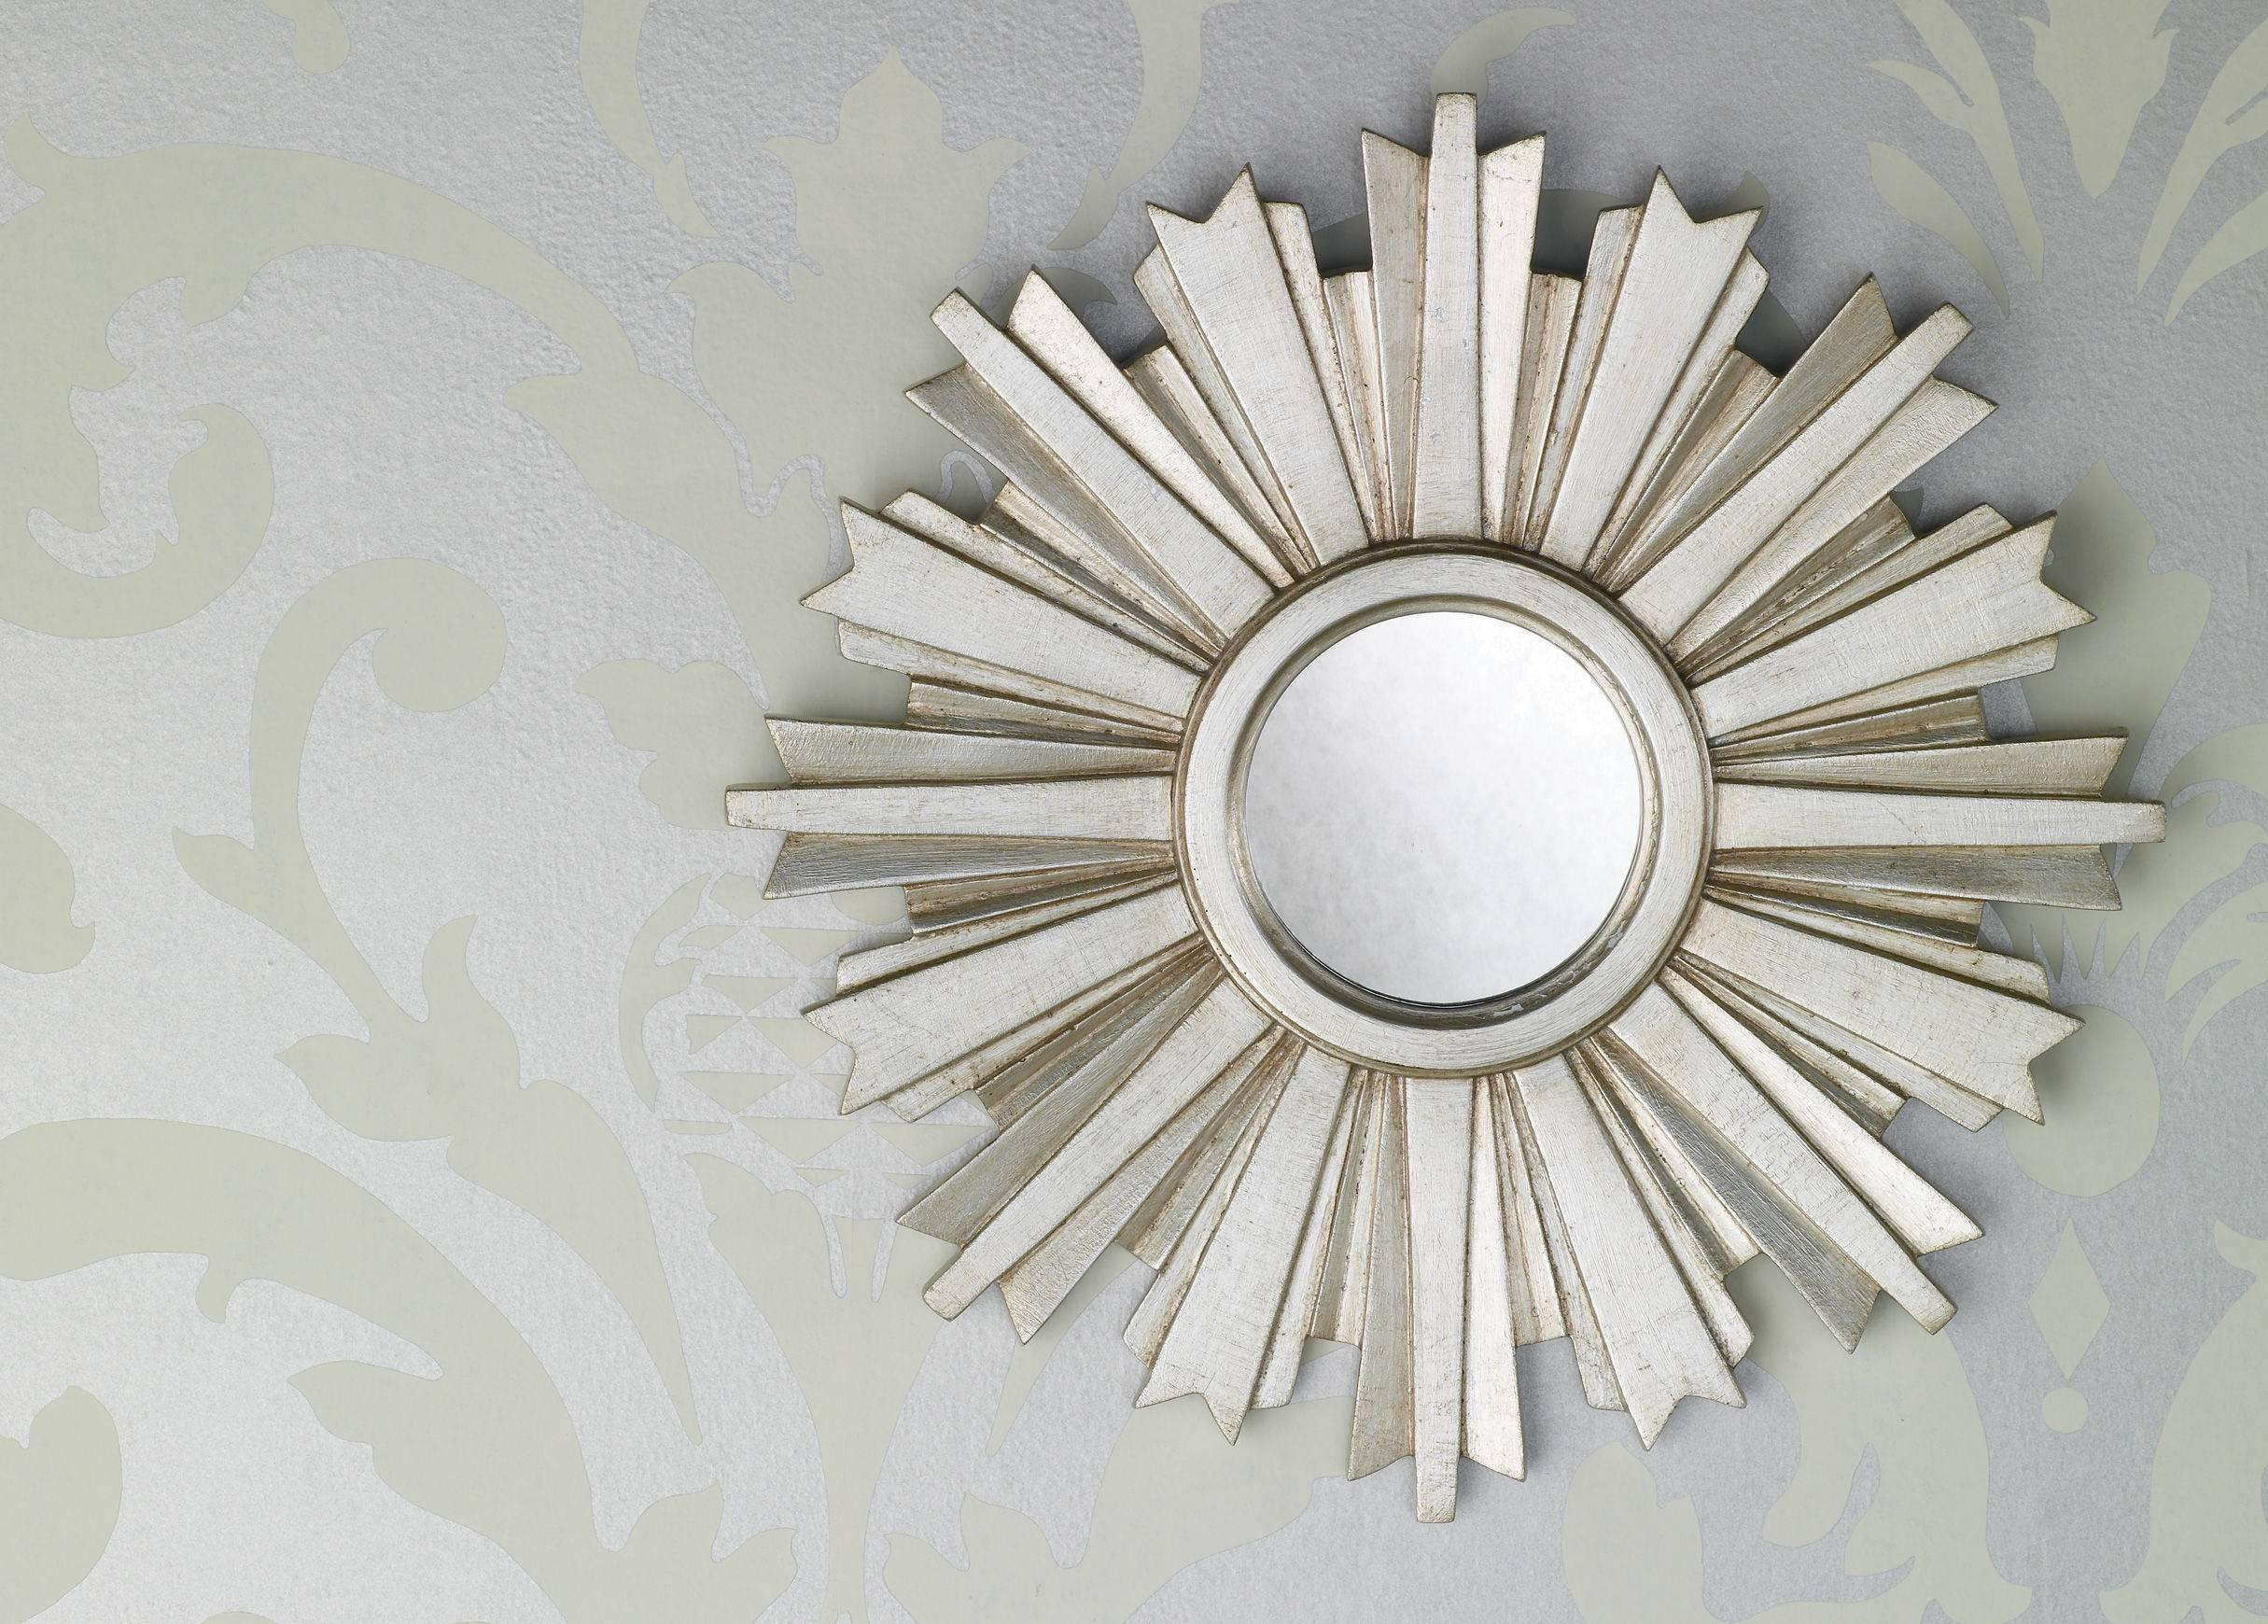 Starburst Mirror Images – Reverse Search Regarding Bronze Starburst Mirrors (View 24 of 25)